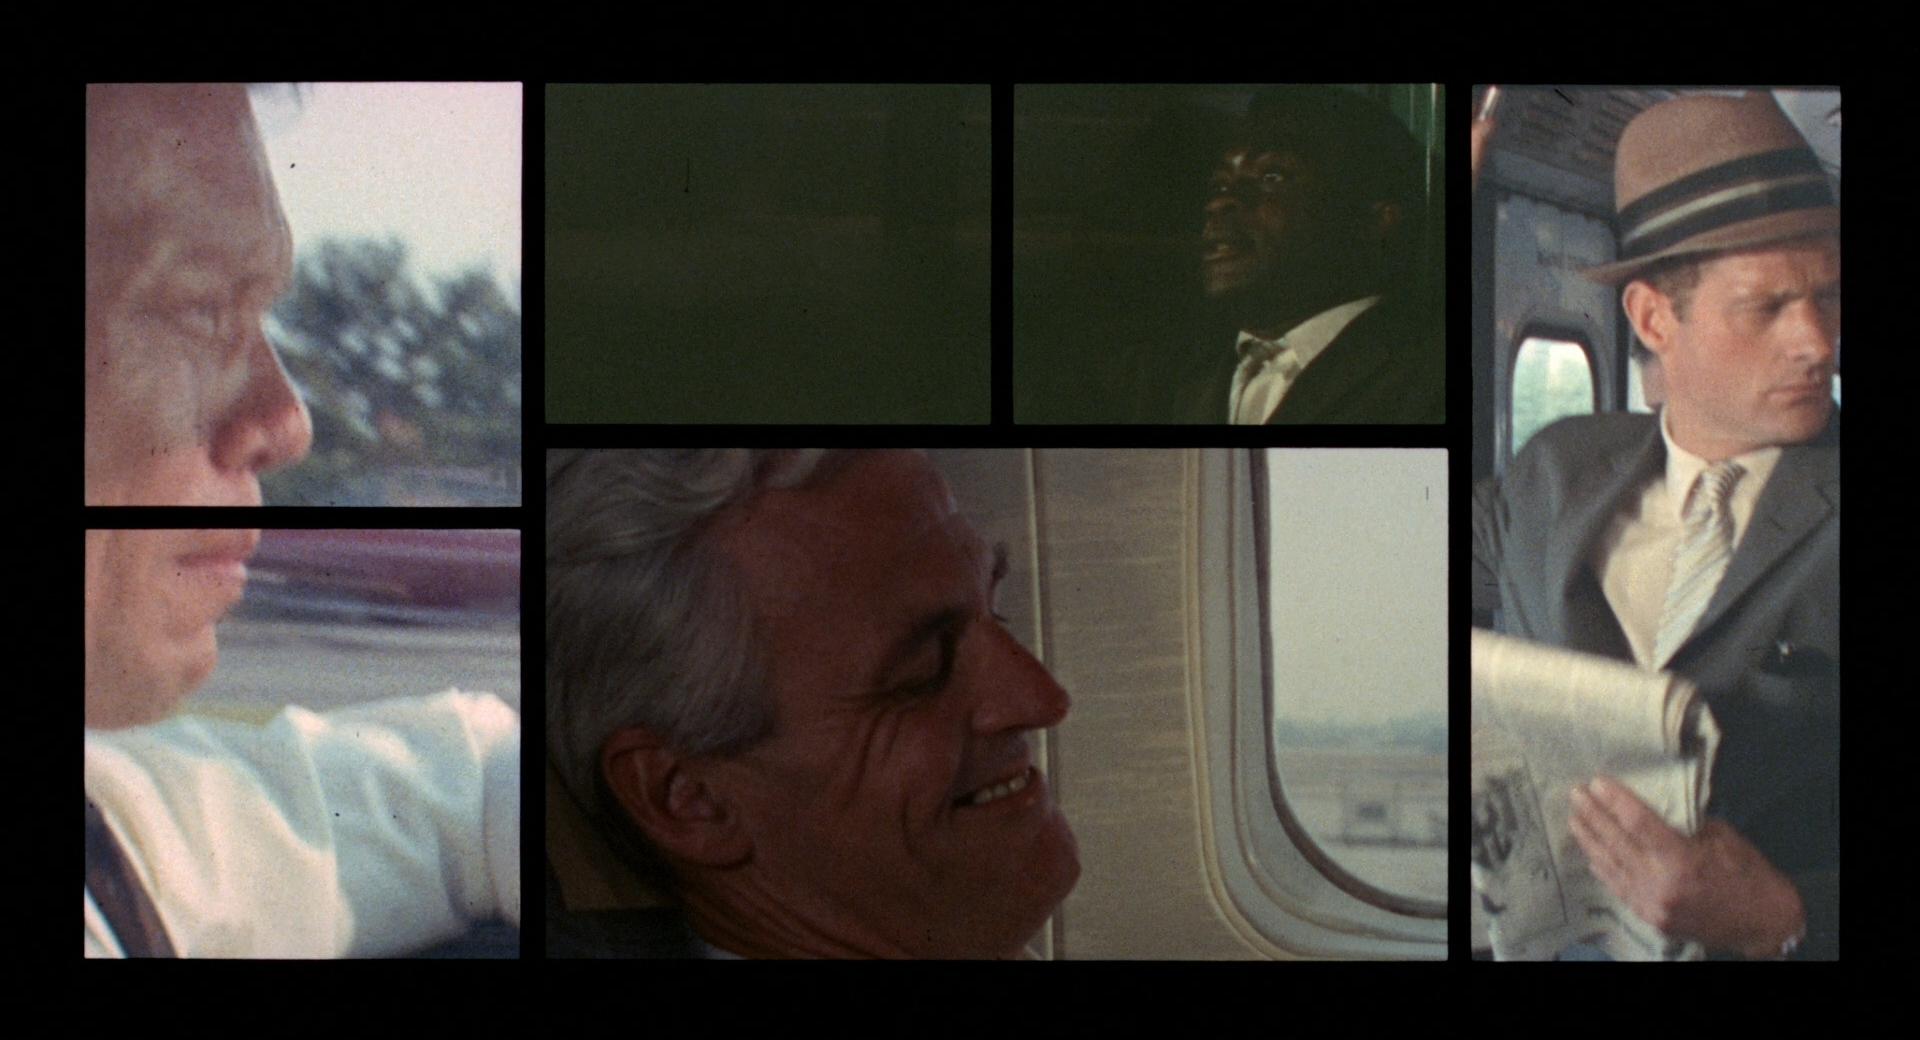 The Thomas Crown Affair - Split Screen